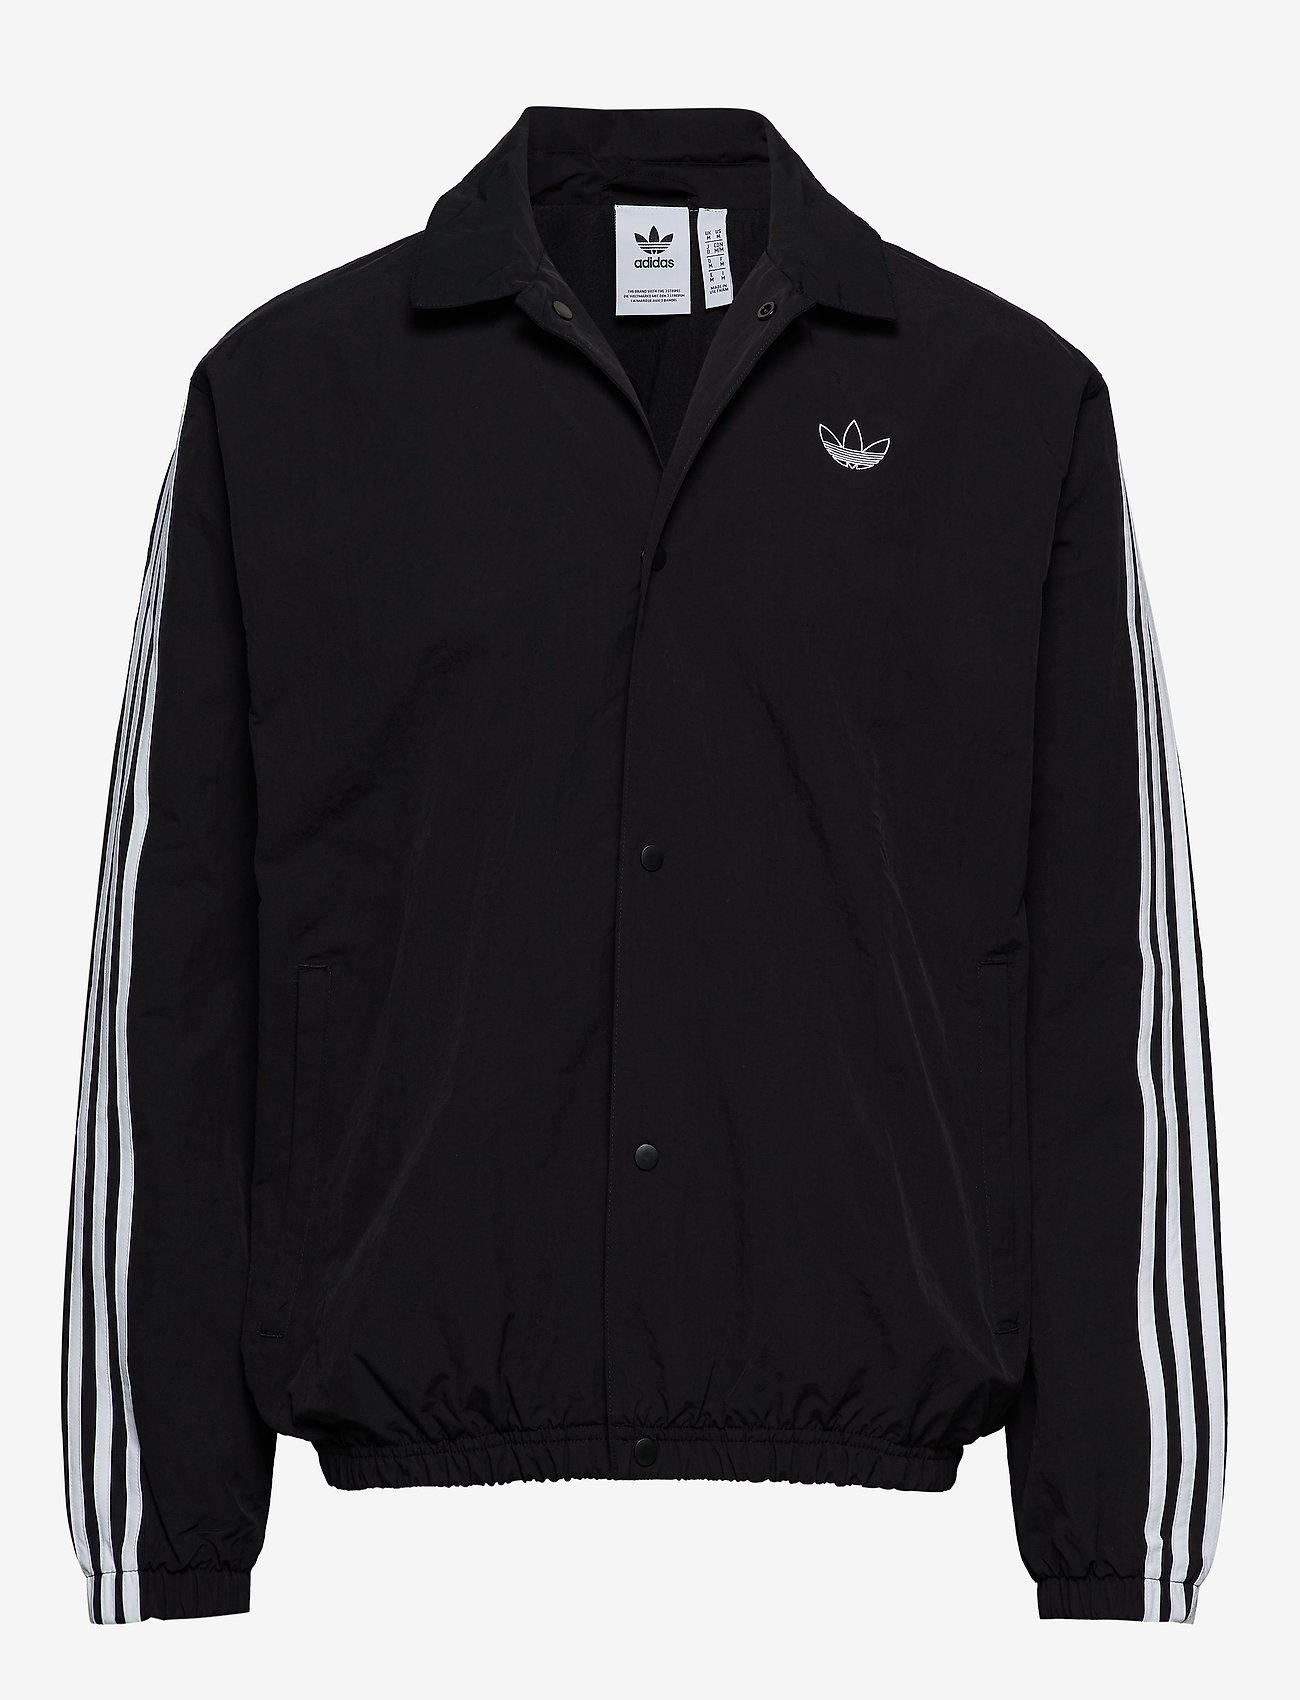 Adidas Originals Trefoil Coach Jakke Black